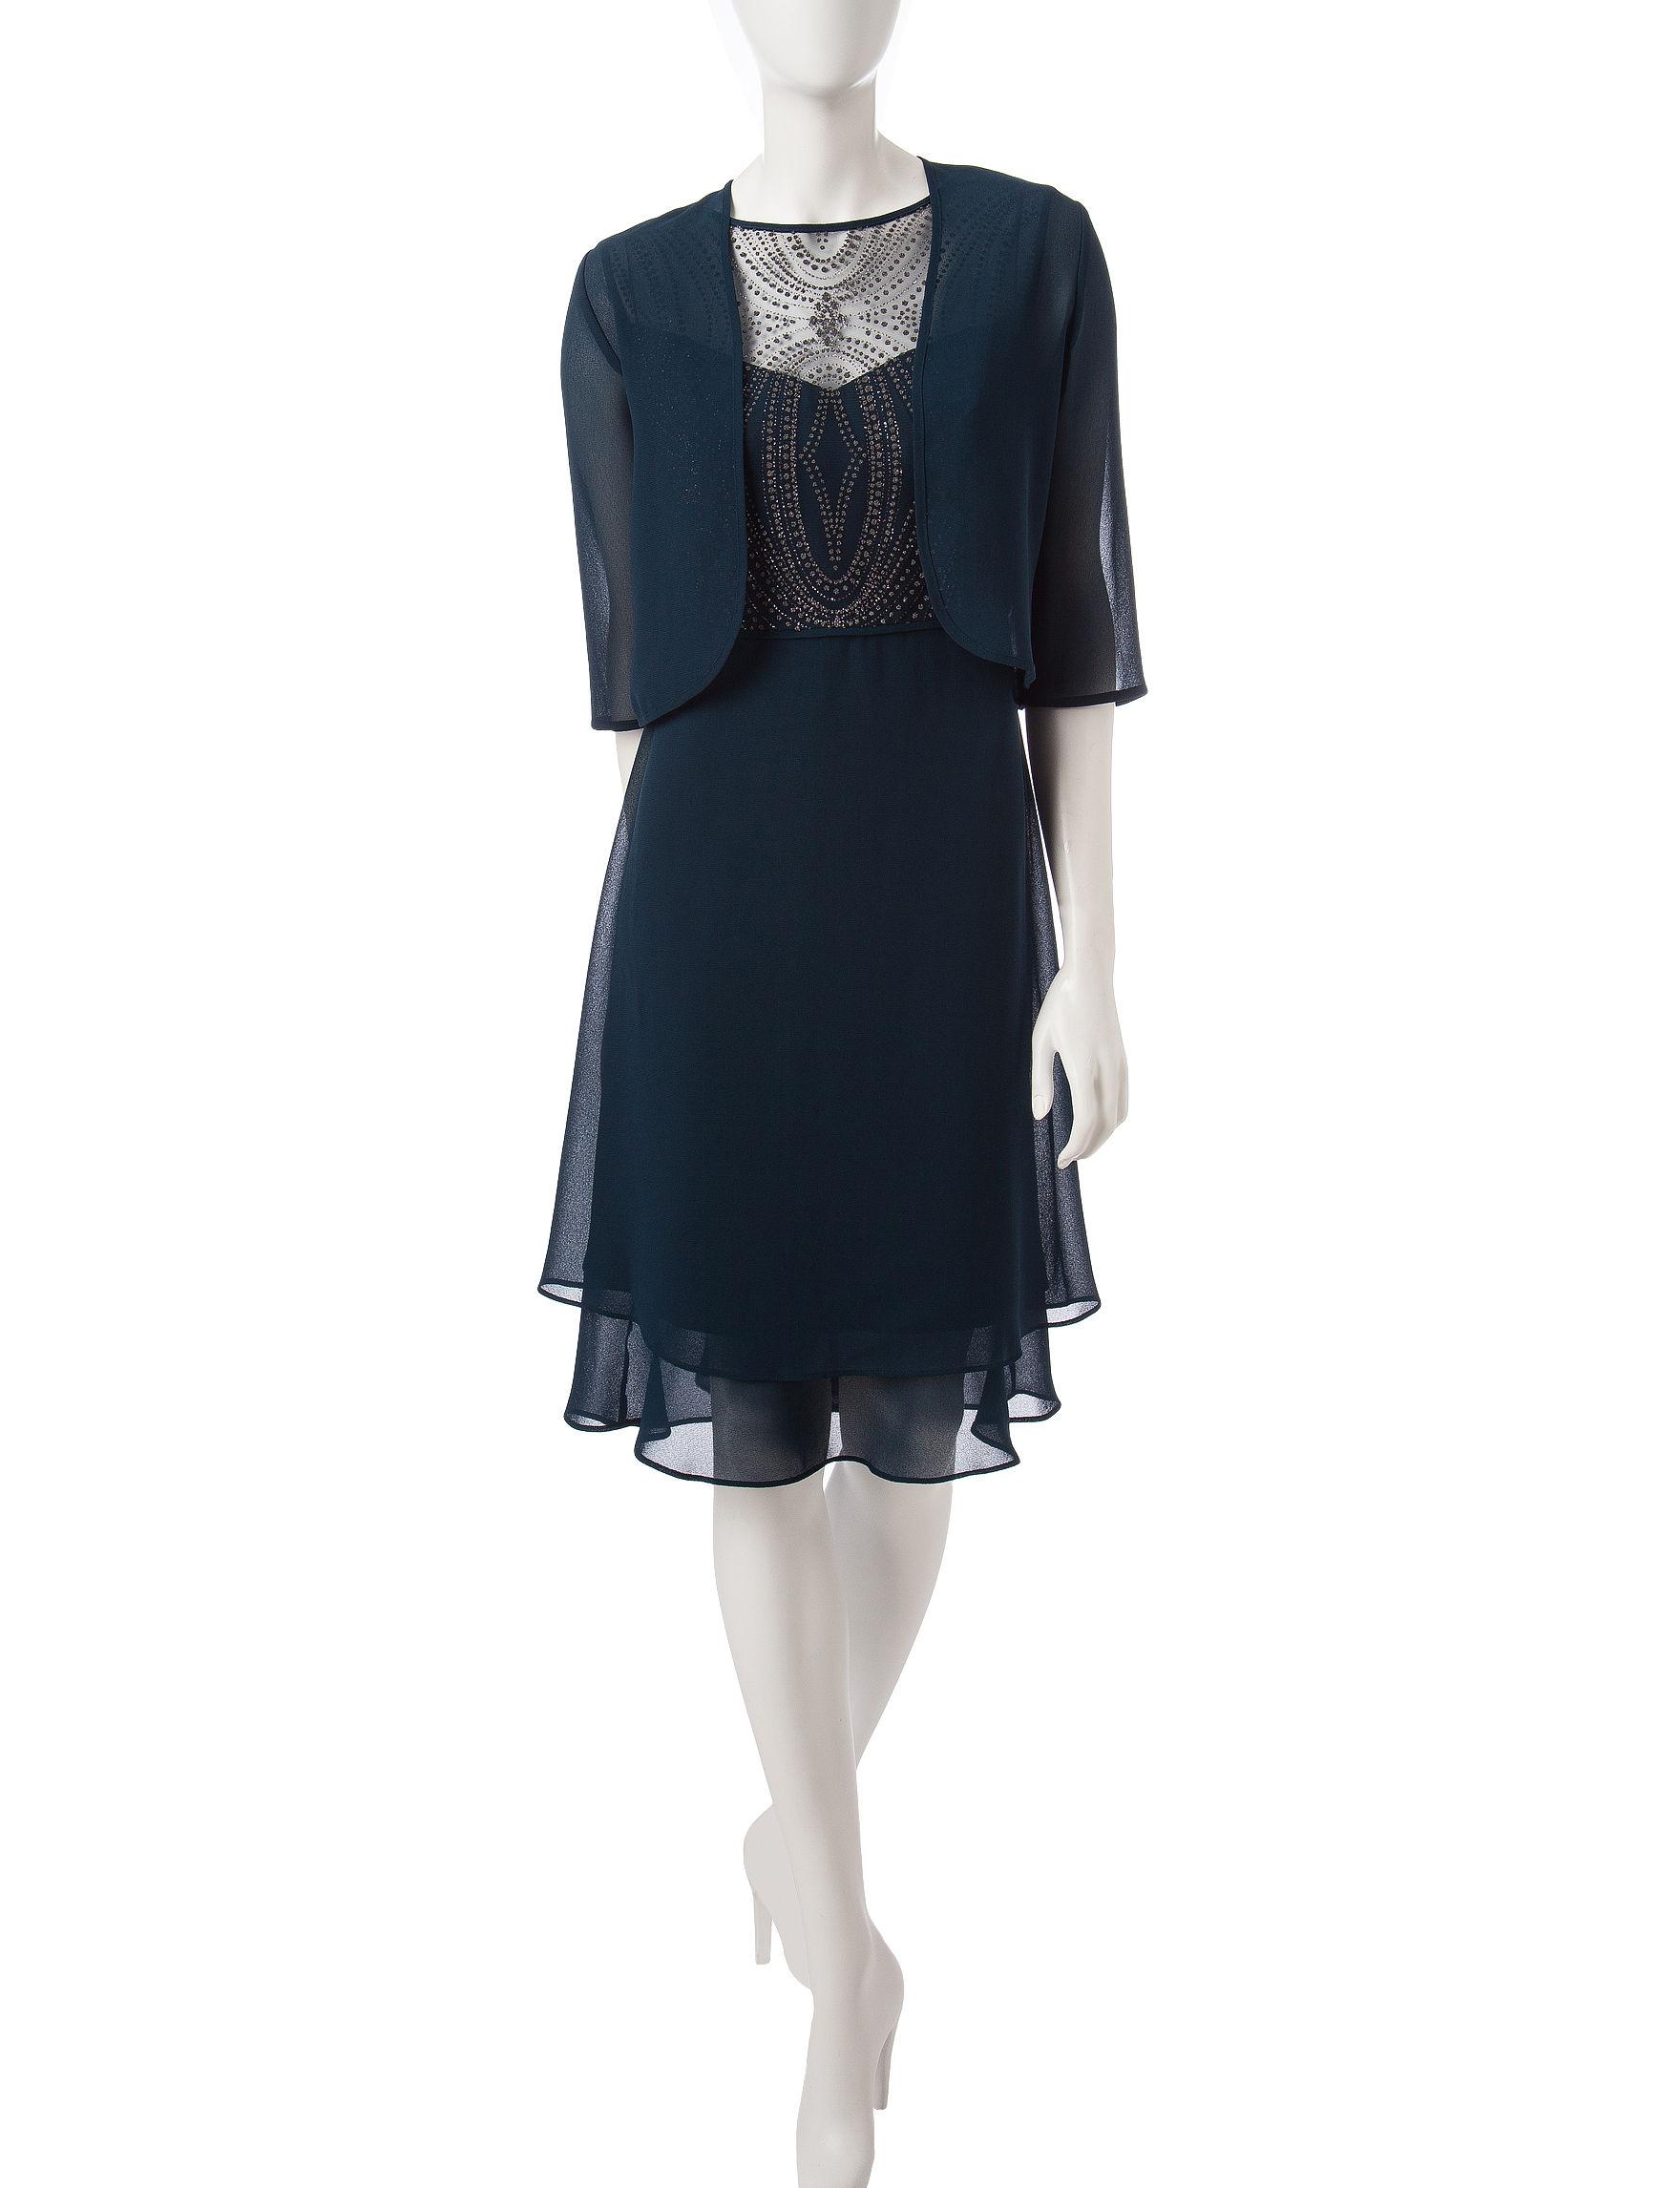 Dana Kay Teal Evening & Formal Jacket Dresses